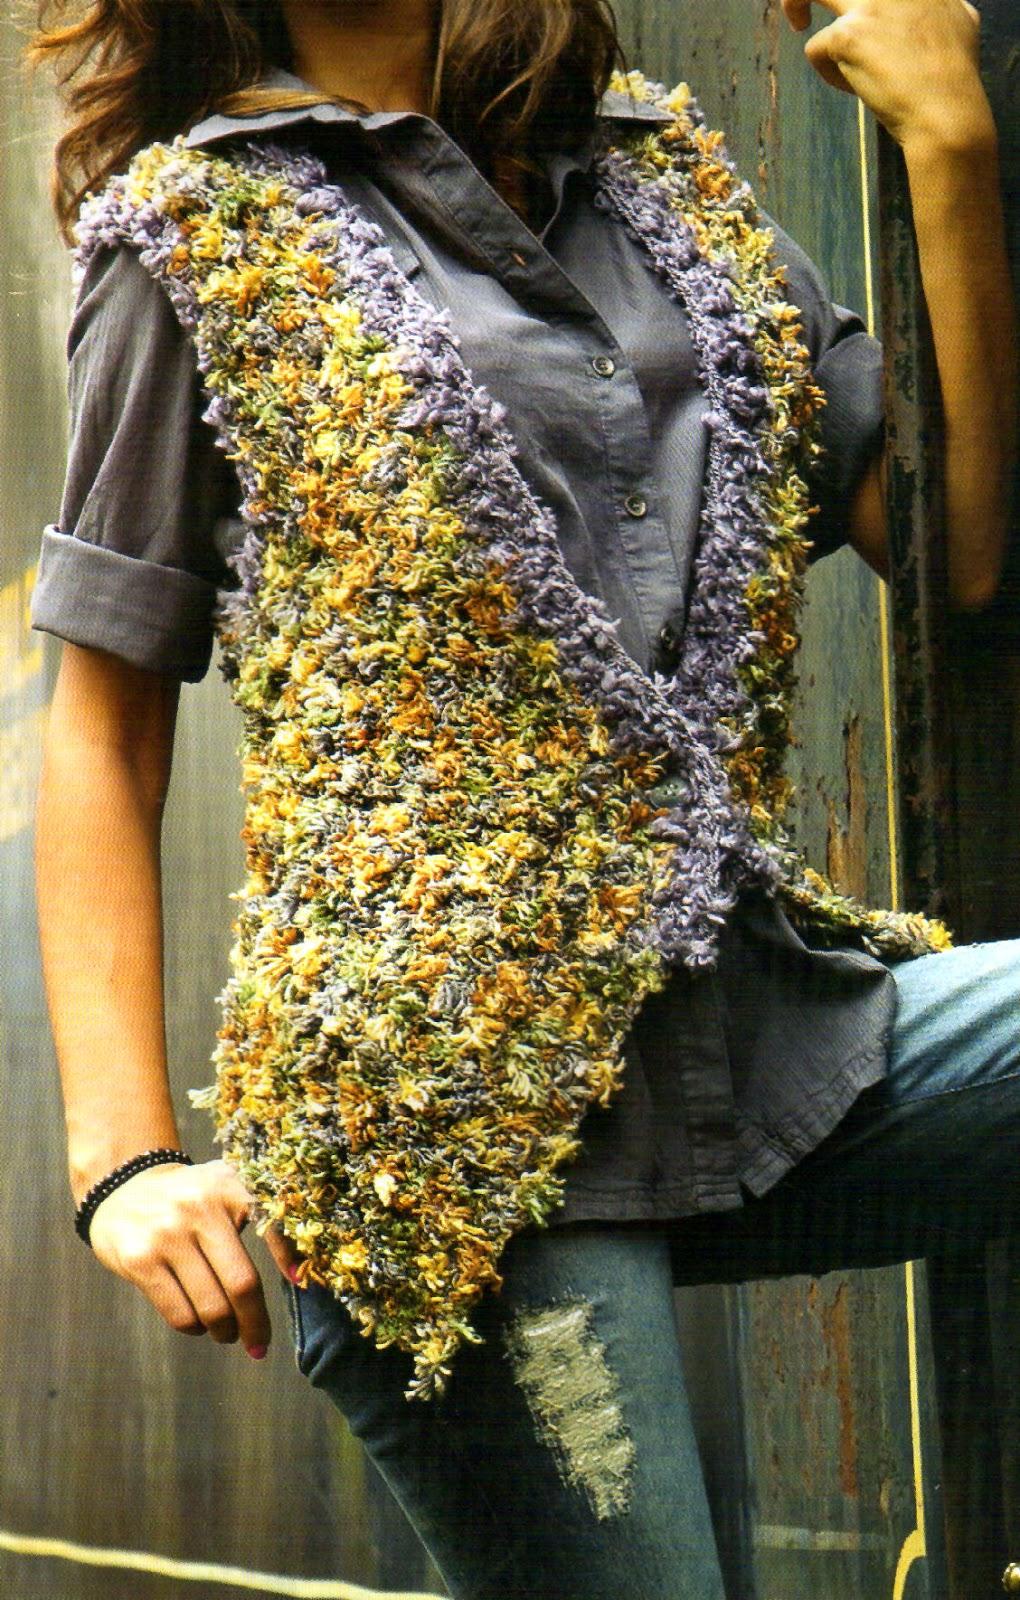 tejidos artesanales en crochet: original chaleco trendy tejido en ...